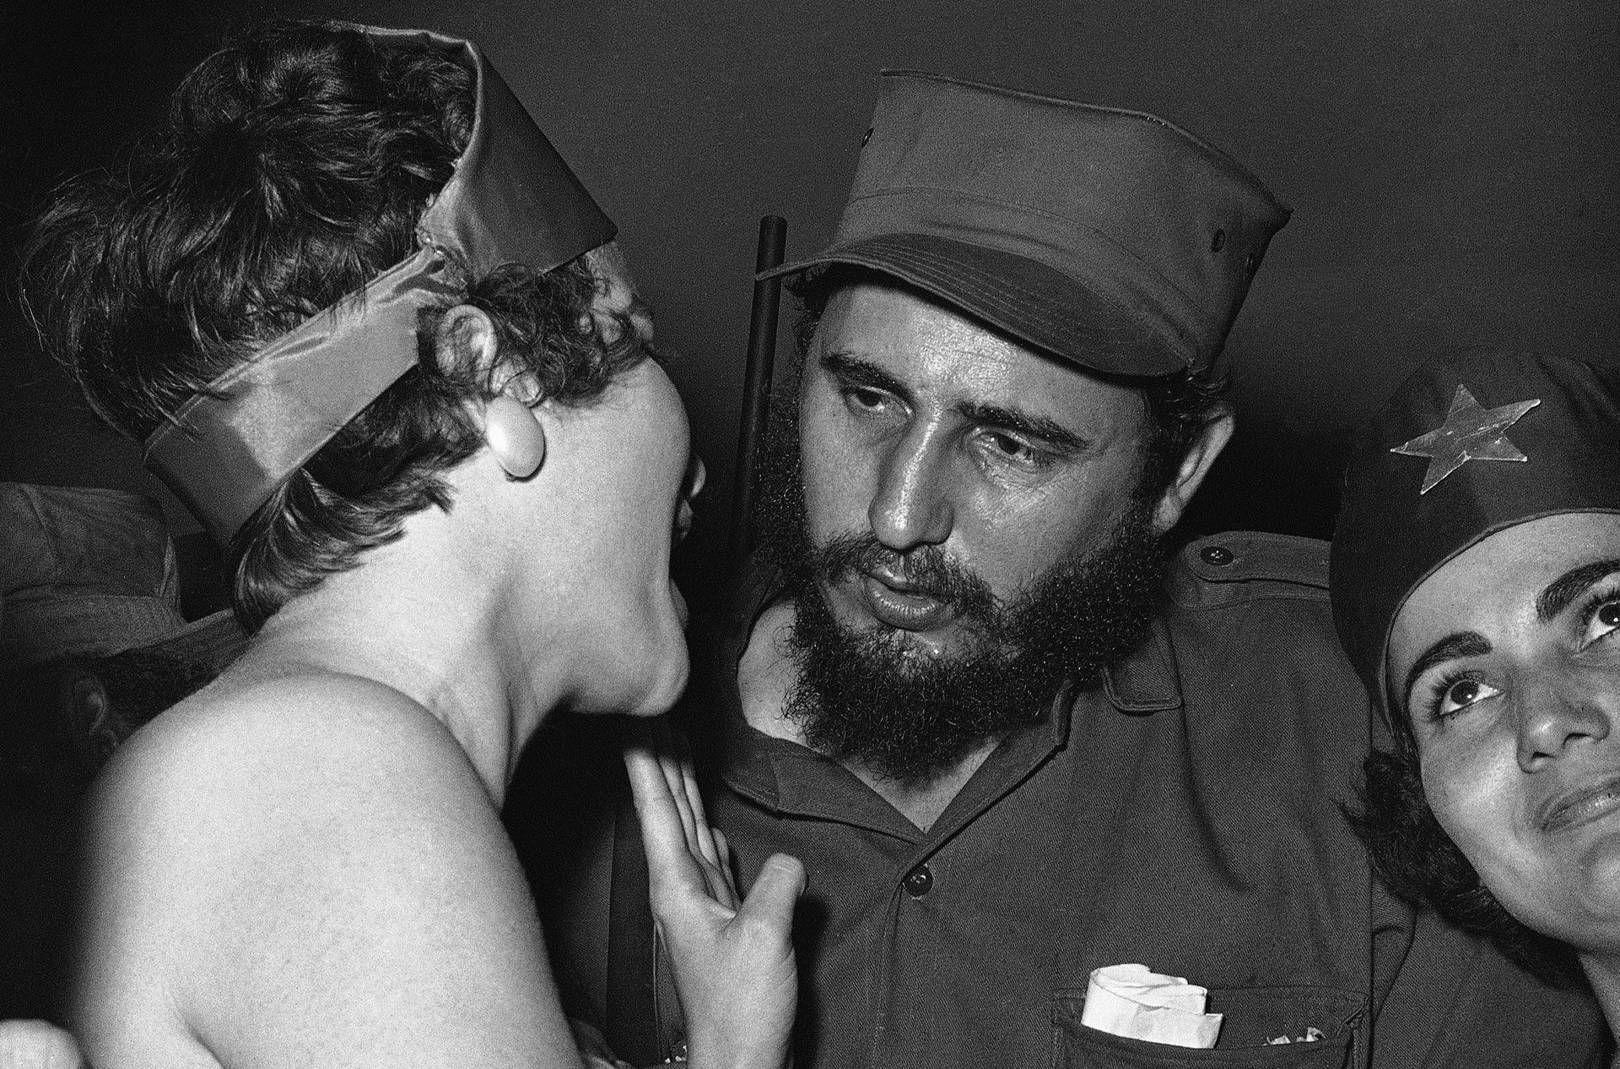 Fidel Castro has slept with over 35,000 women.